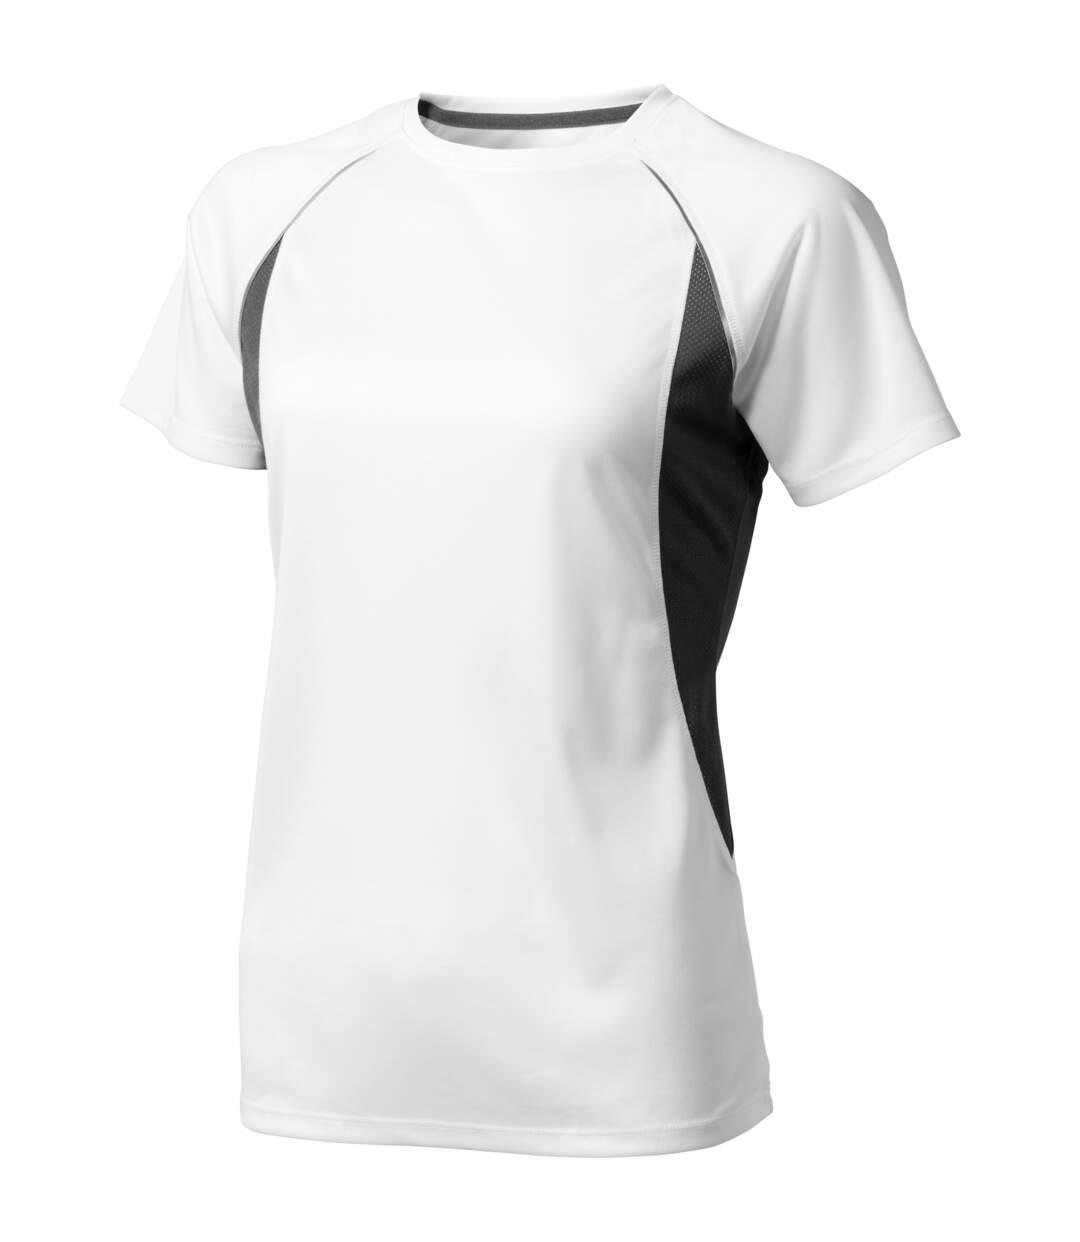 Elevate - T-Shirt Manches Courtes Quebec - Femme (Blanc/ Anthracite) - UTPF1883